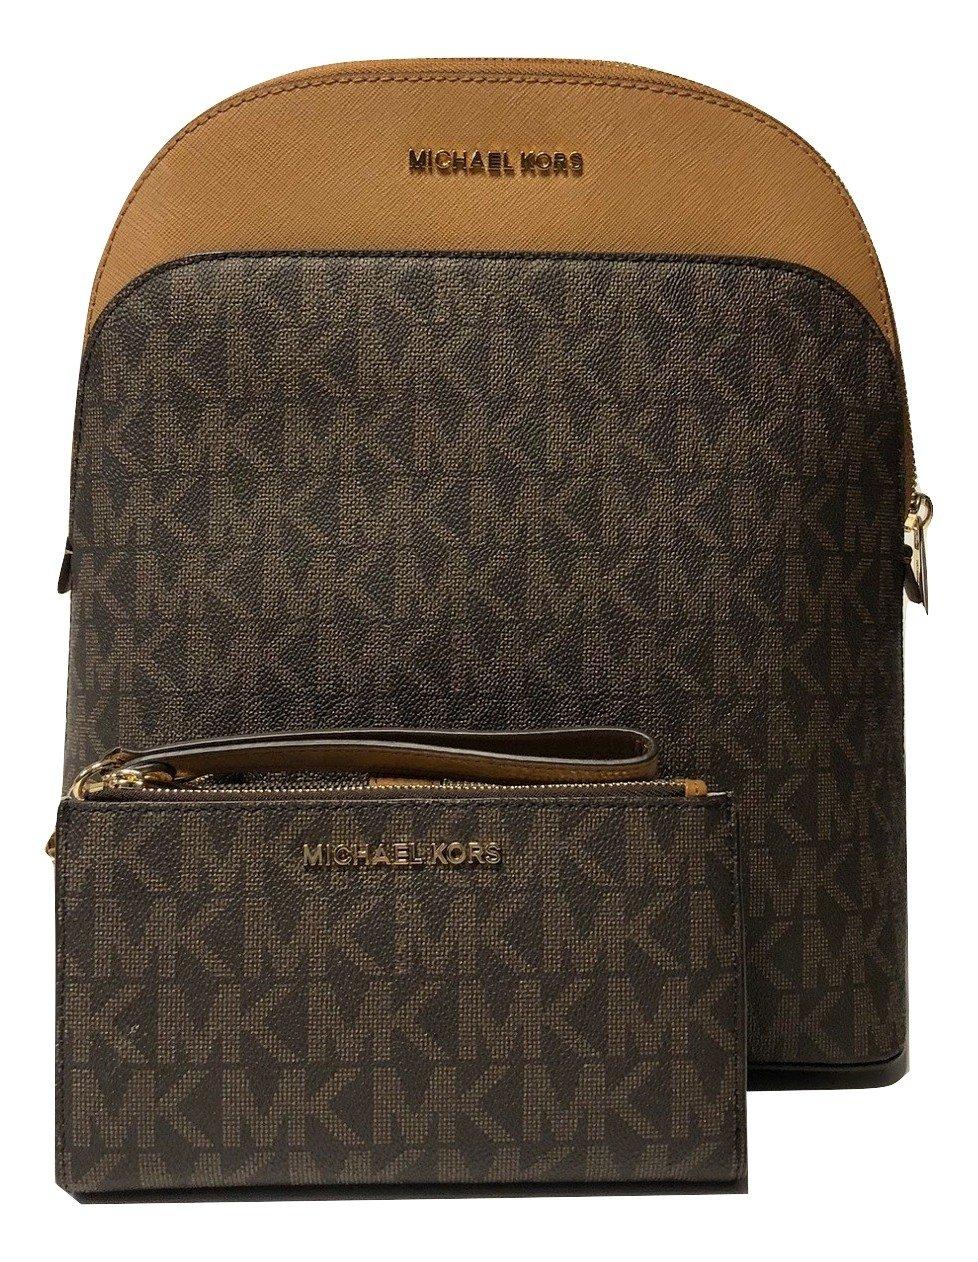 MICHAEL Michael Kors Emmy Large Backpack bundled with Michael Kors Jet Set Travel Double Zip Wallet Wristlet (Signature Brown/Acorn)